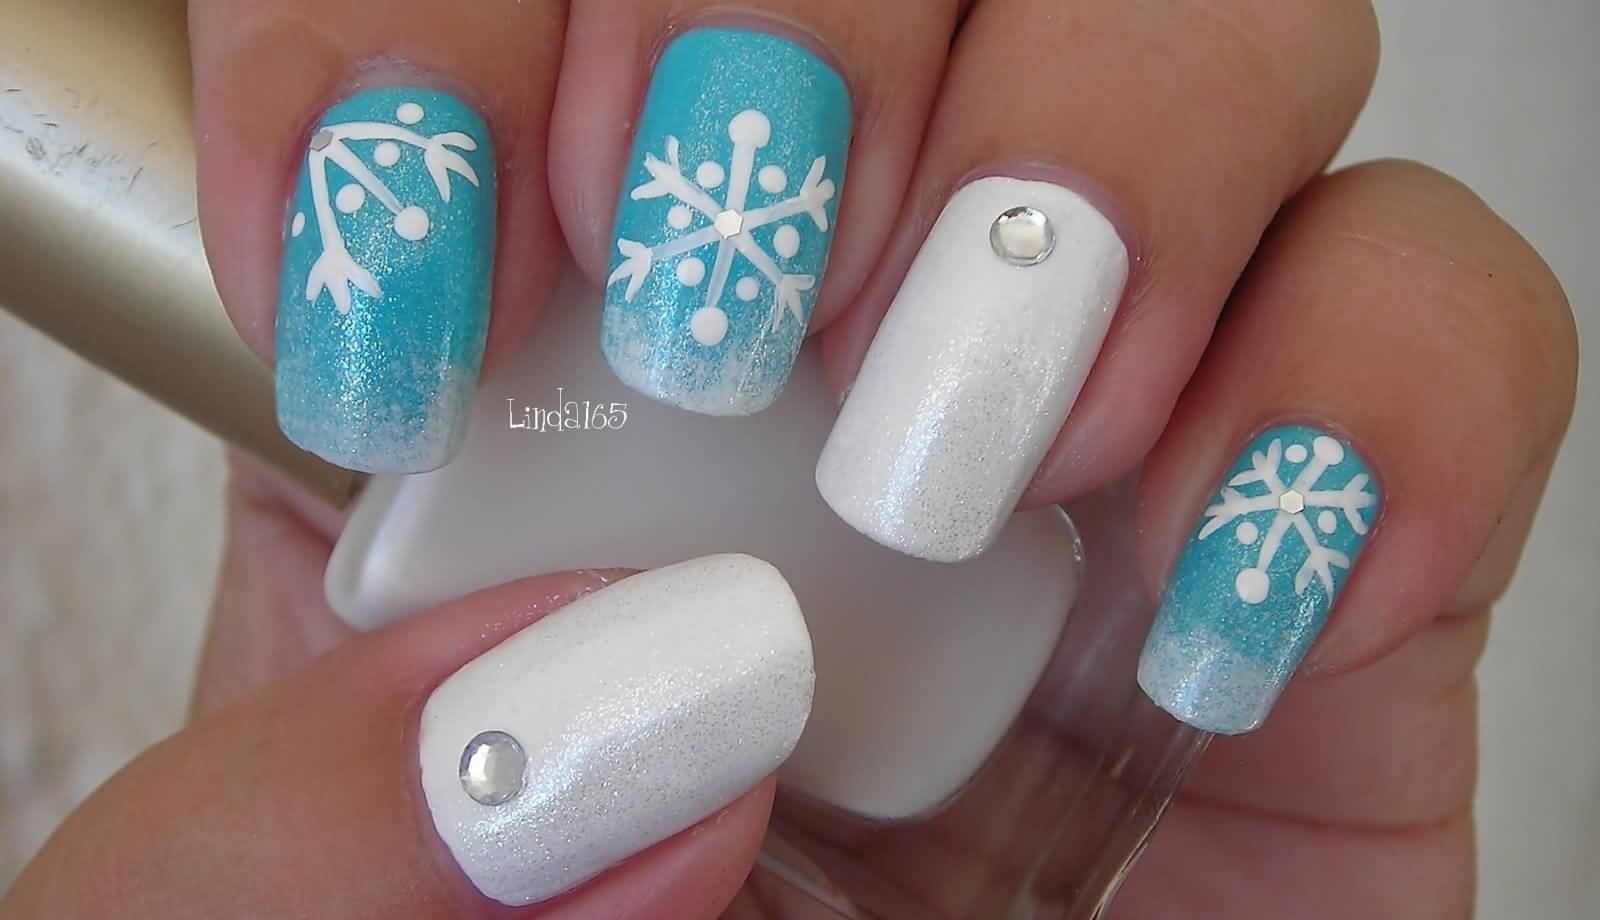 Blue Nails With White Snowflakes Design Nail Art Tutorial